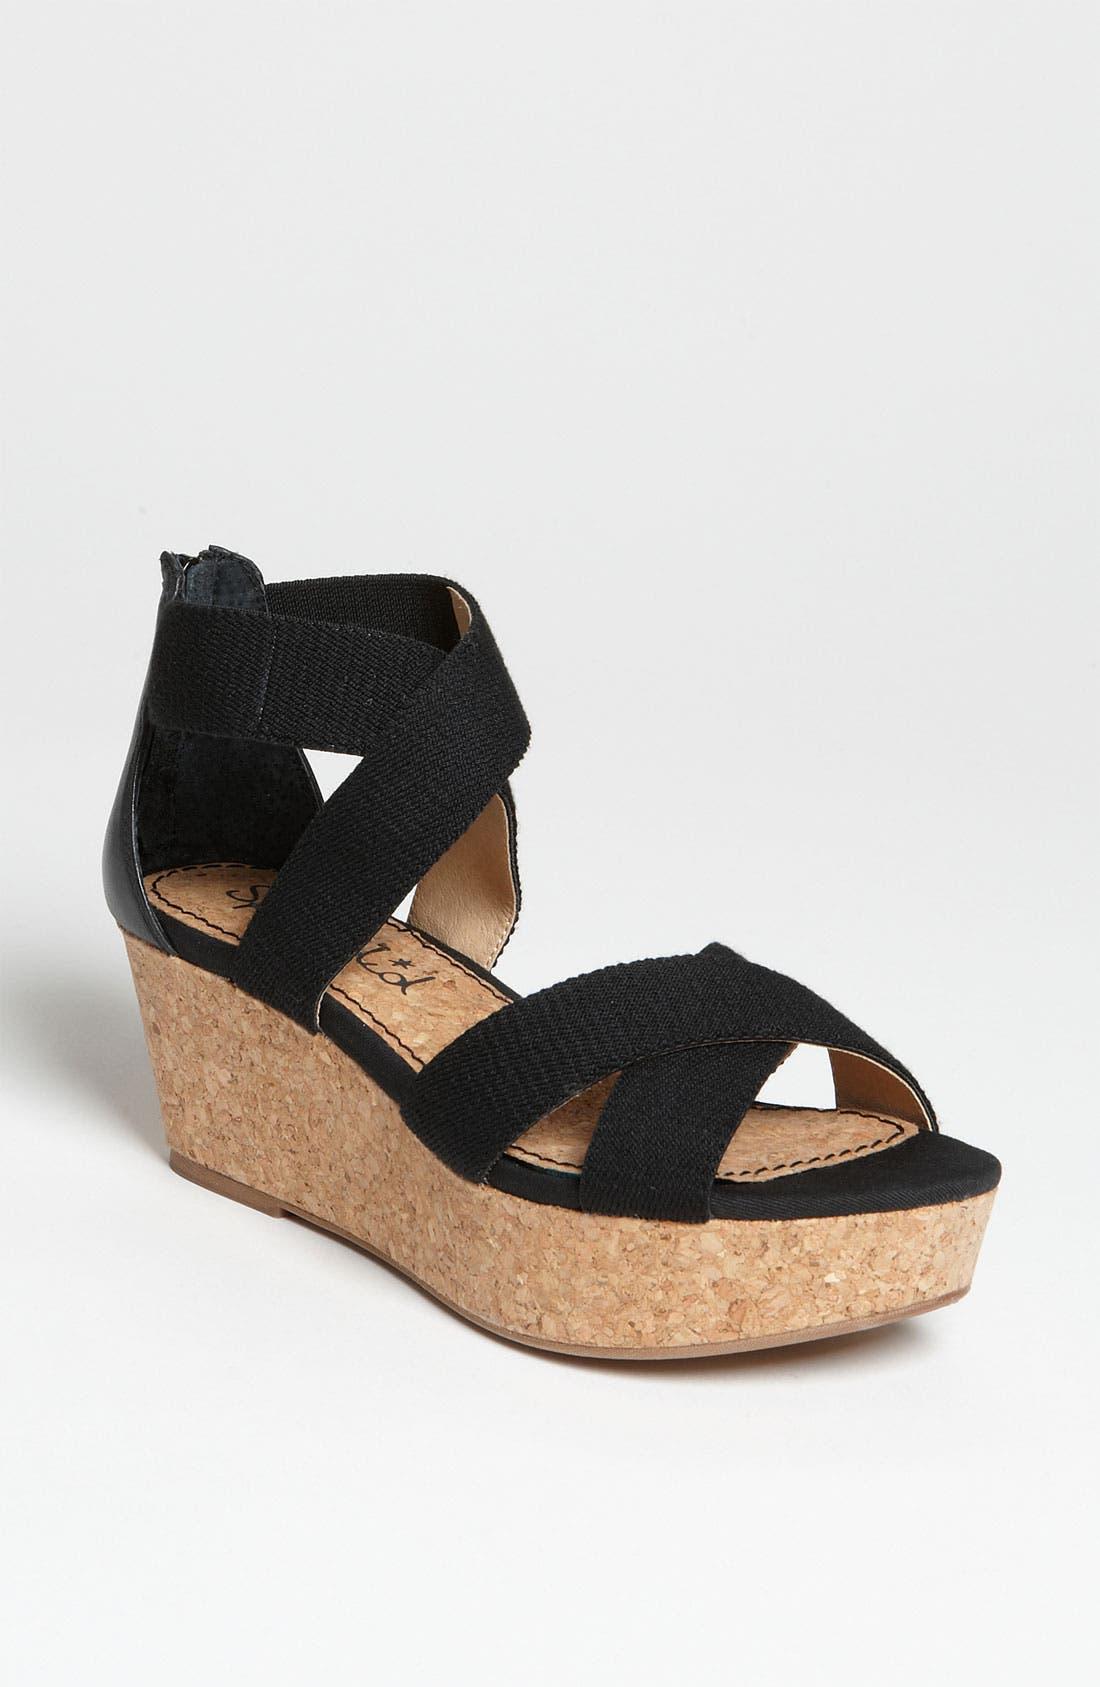 Main Image - Splendid 'Wishful' Platform Sandal